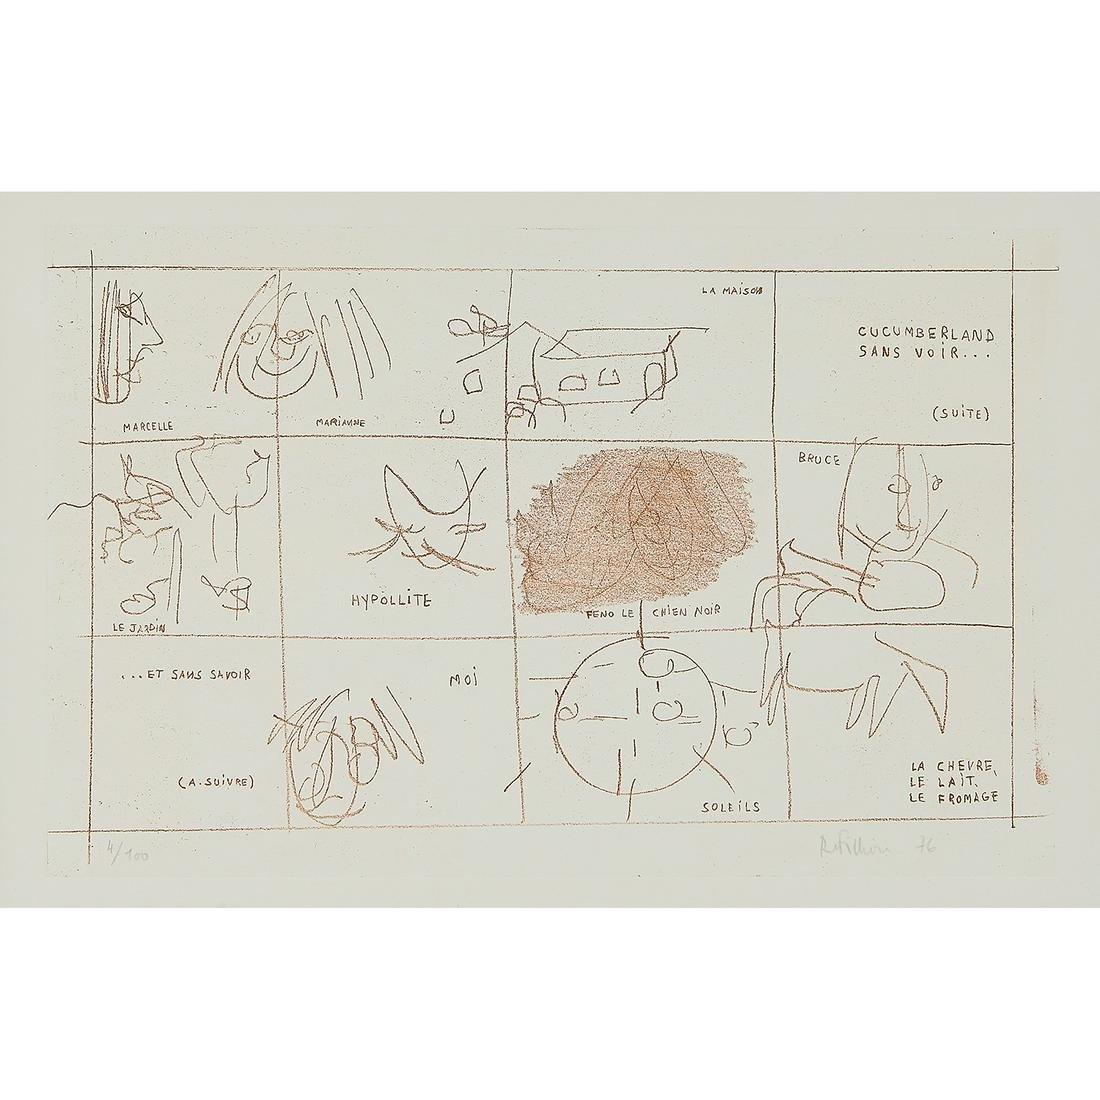 Robert Fillion, Cucumberland, color lithograph